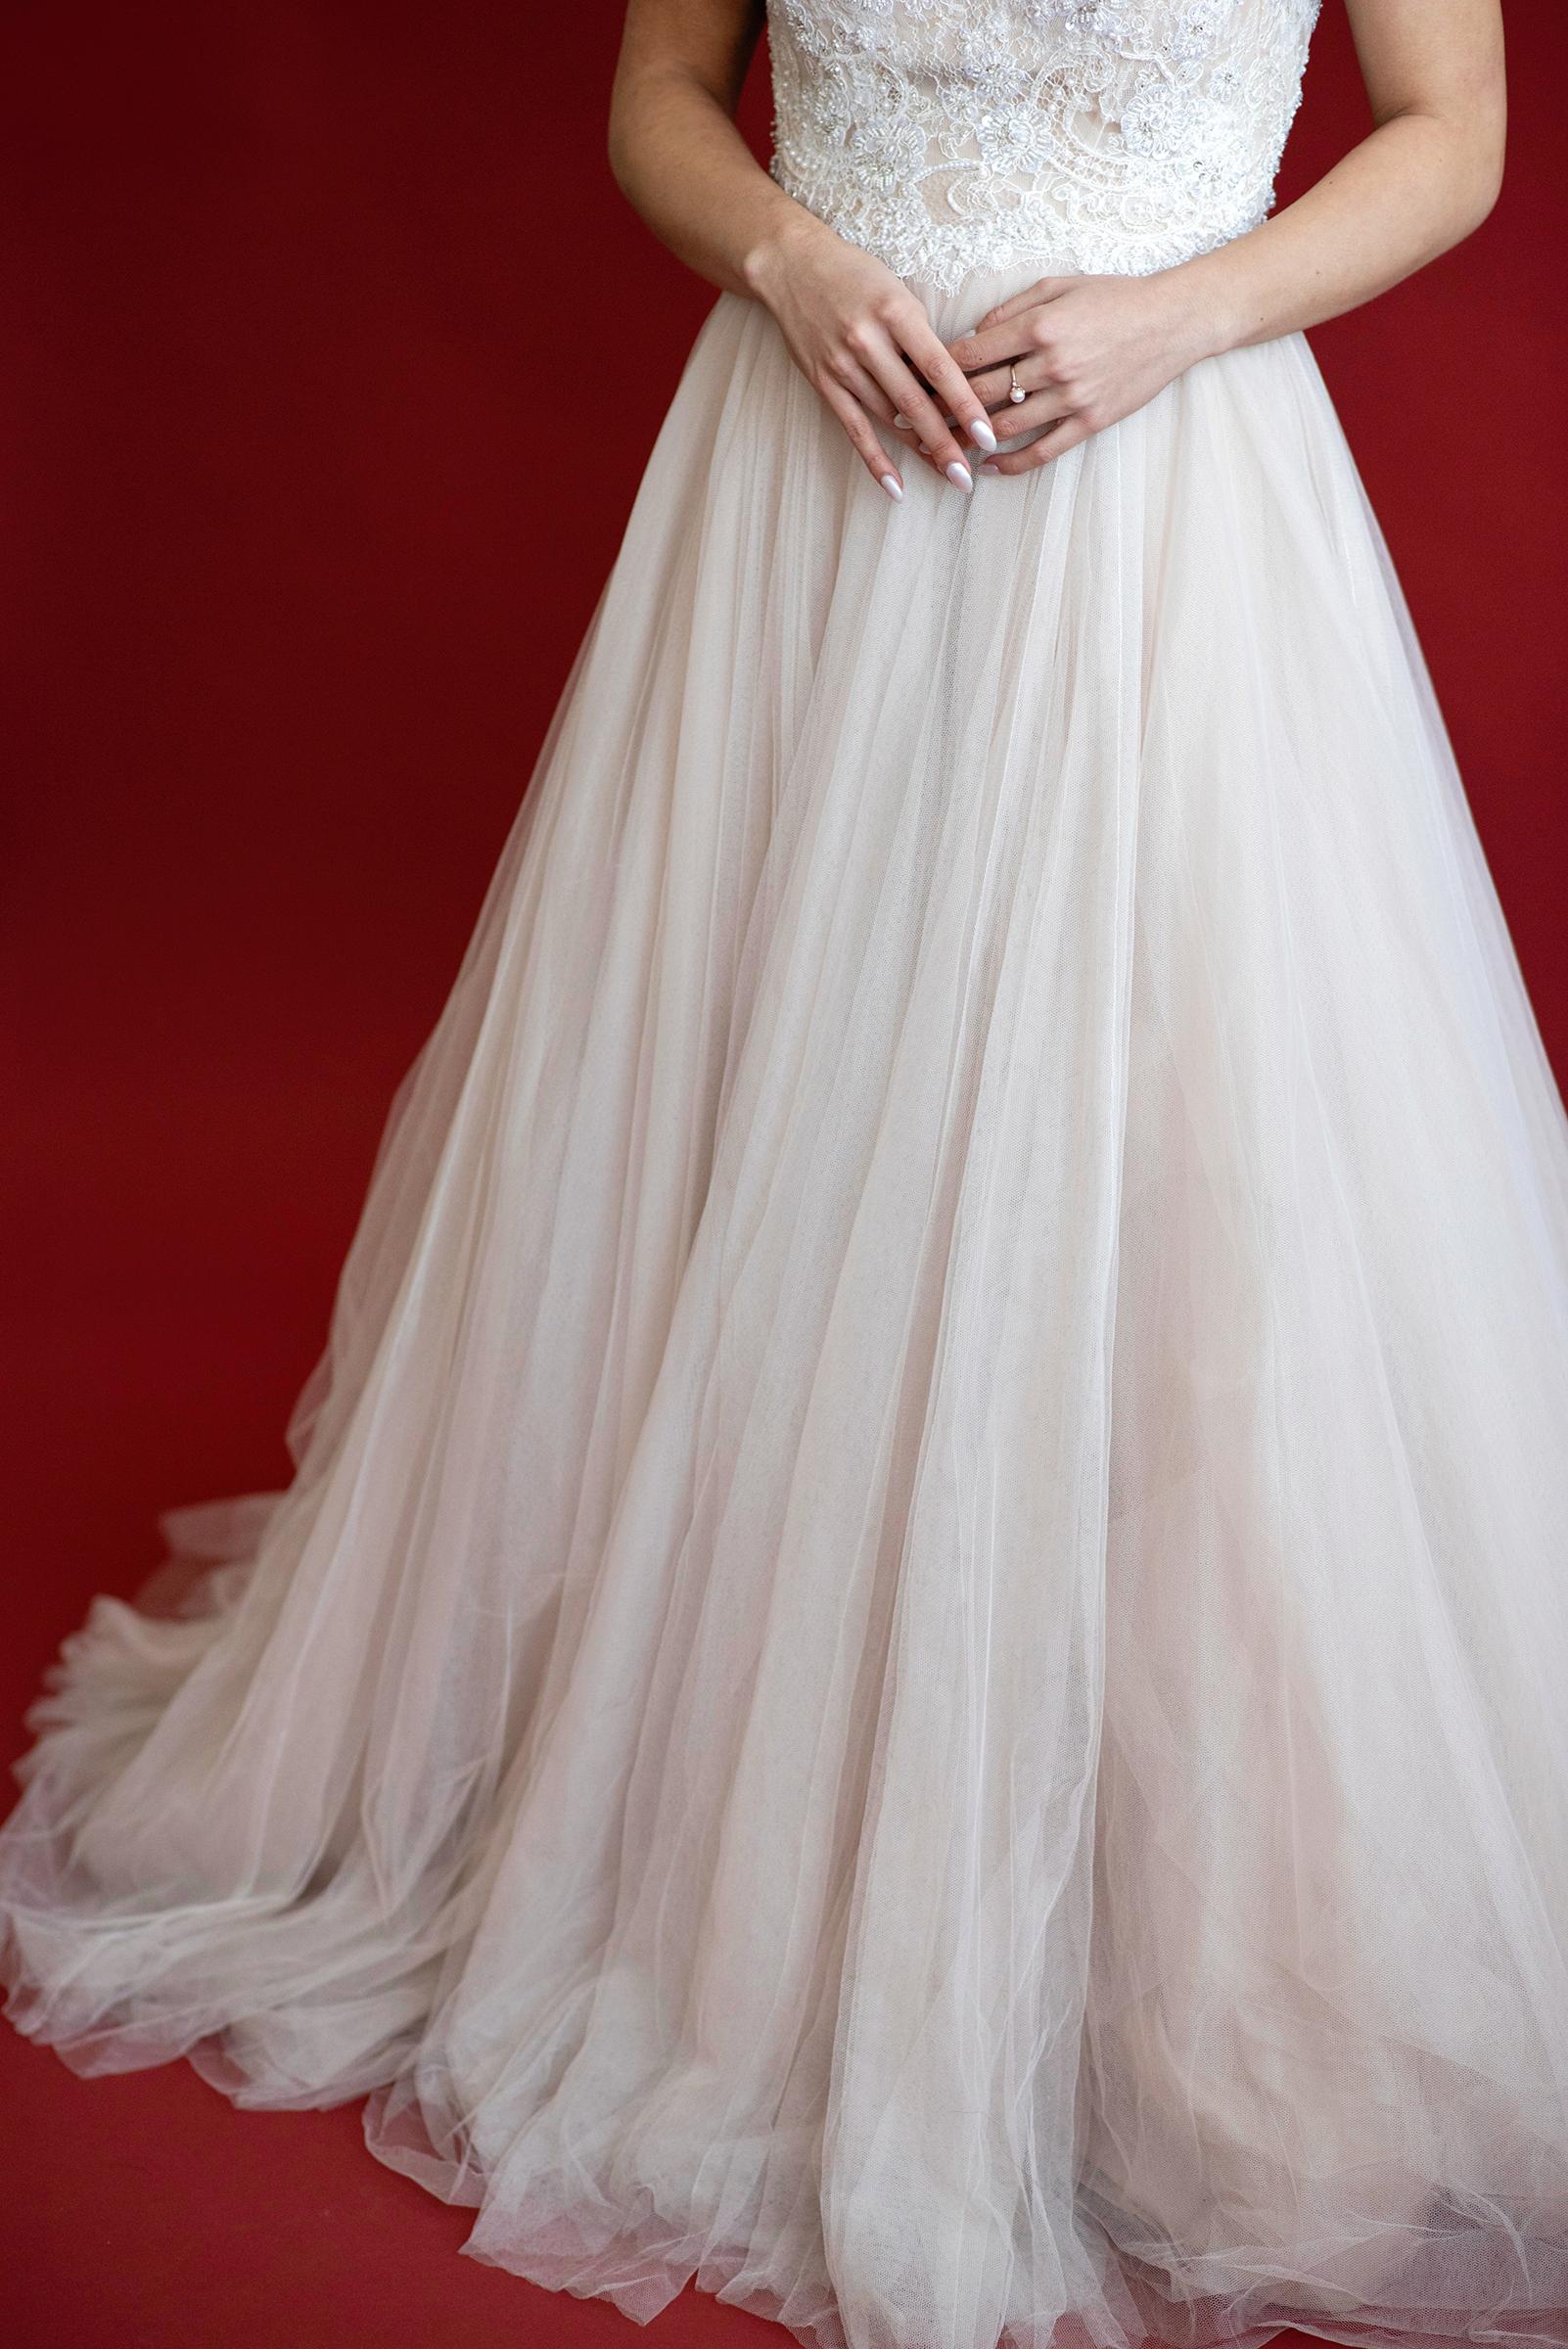 Stephanie-Second Dress Details-7.jpg